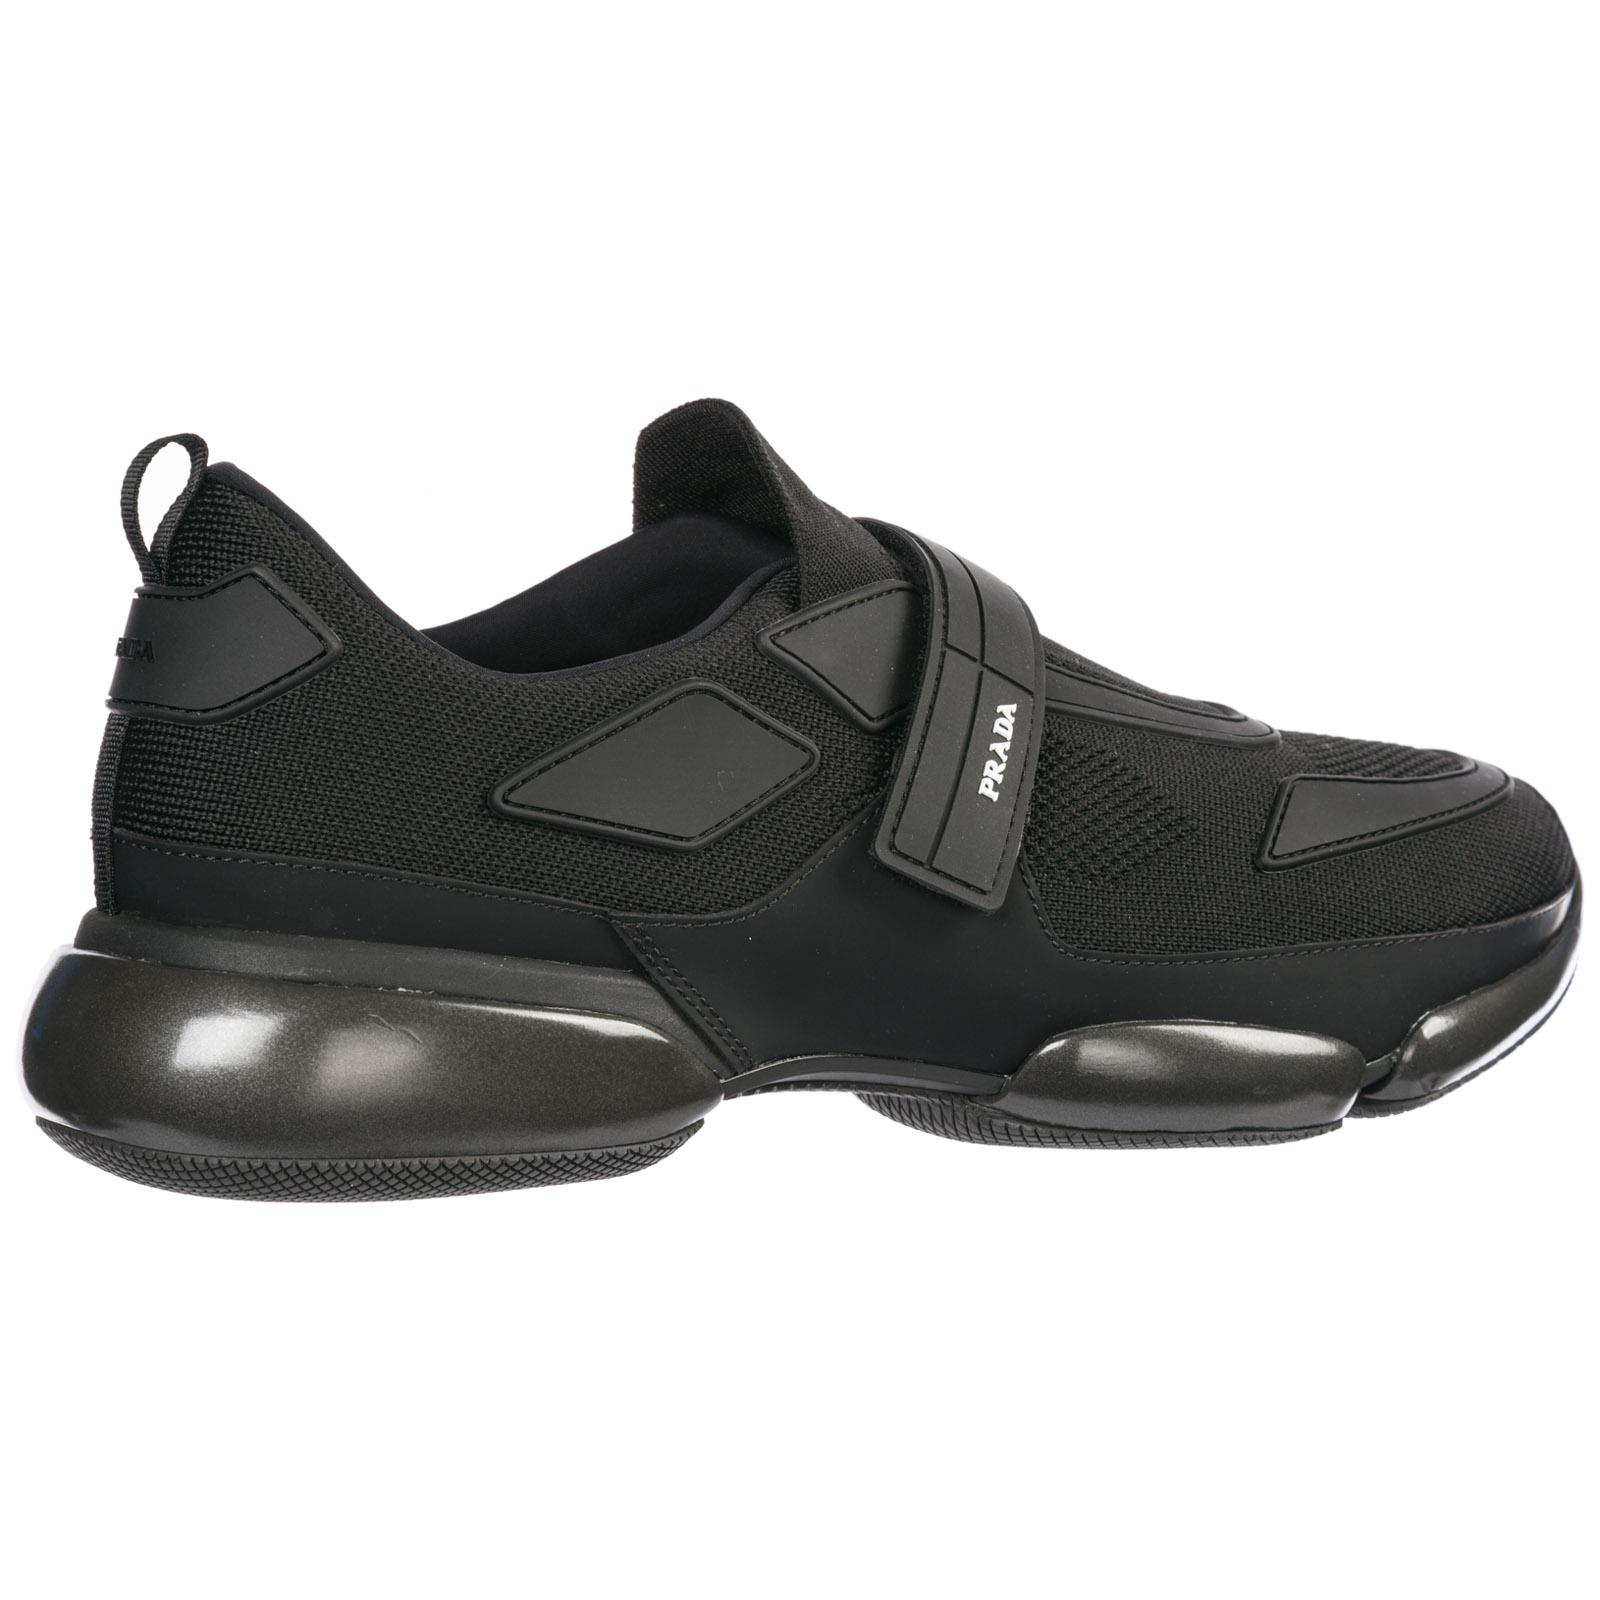 Sneakers Prada Cloudbust 2OG064 1OUF F0806 nero  b72b4b54969